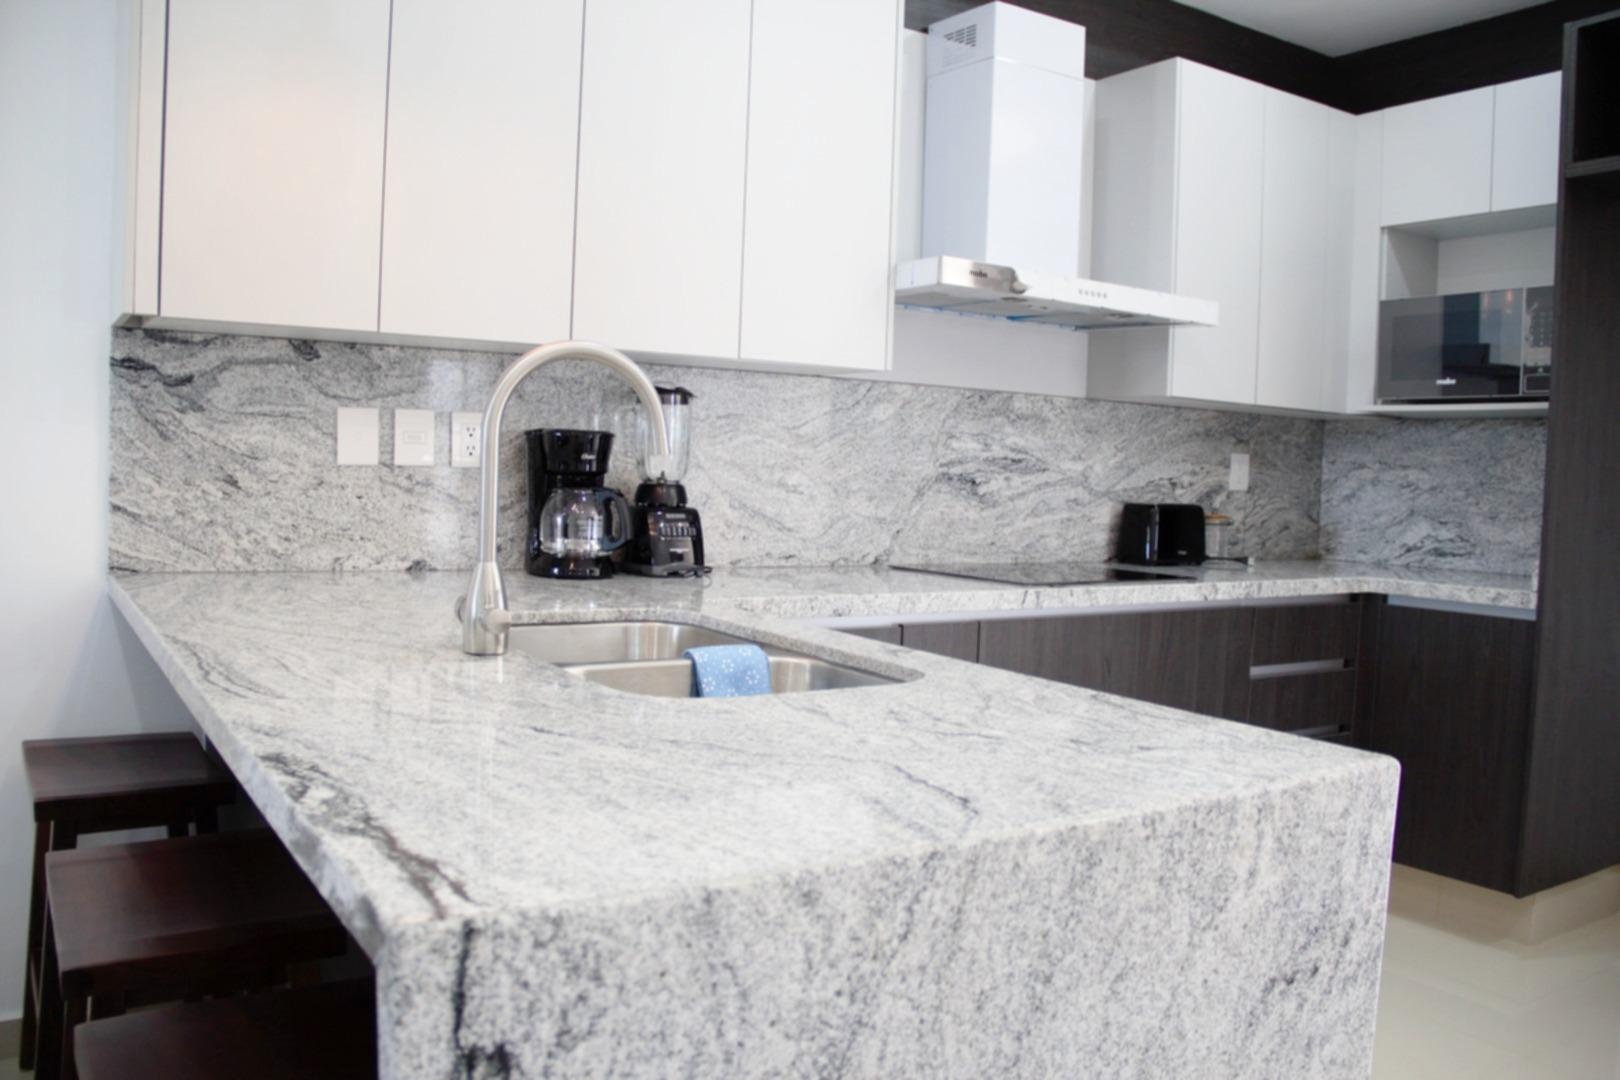 Large modern kitchen with breakfast bar.